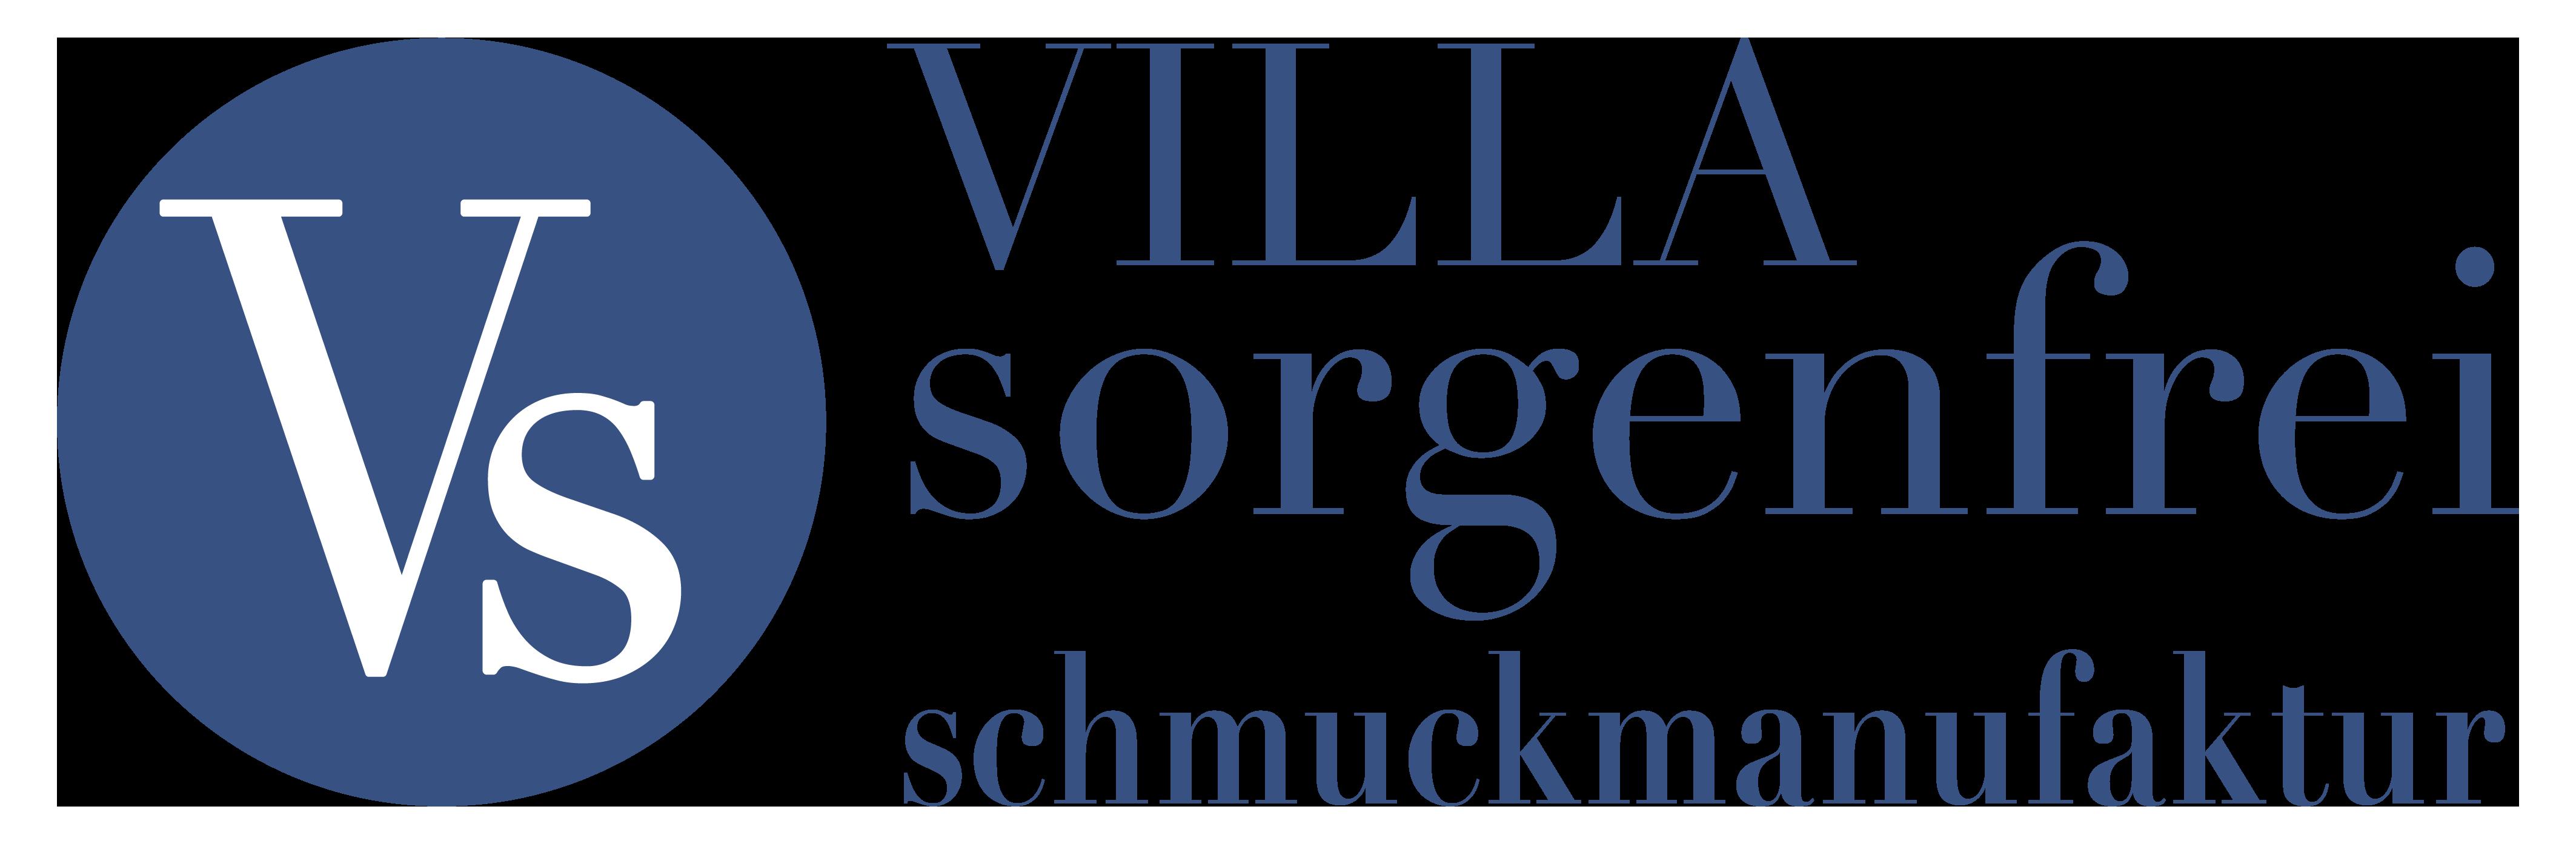 Villa Sorgenfrei Schmuckmanufaktur-Logo